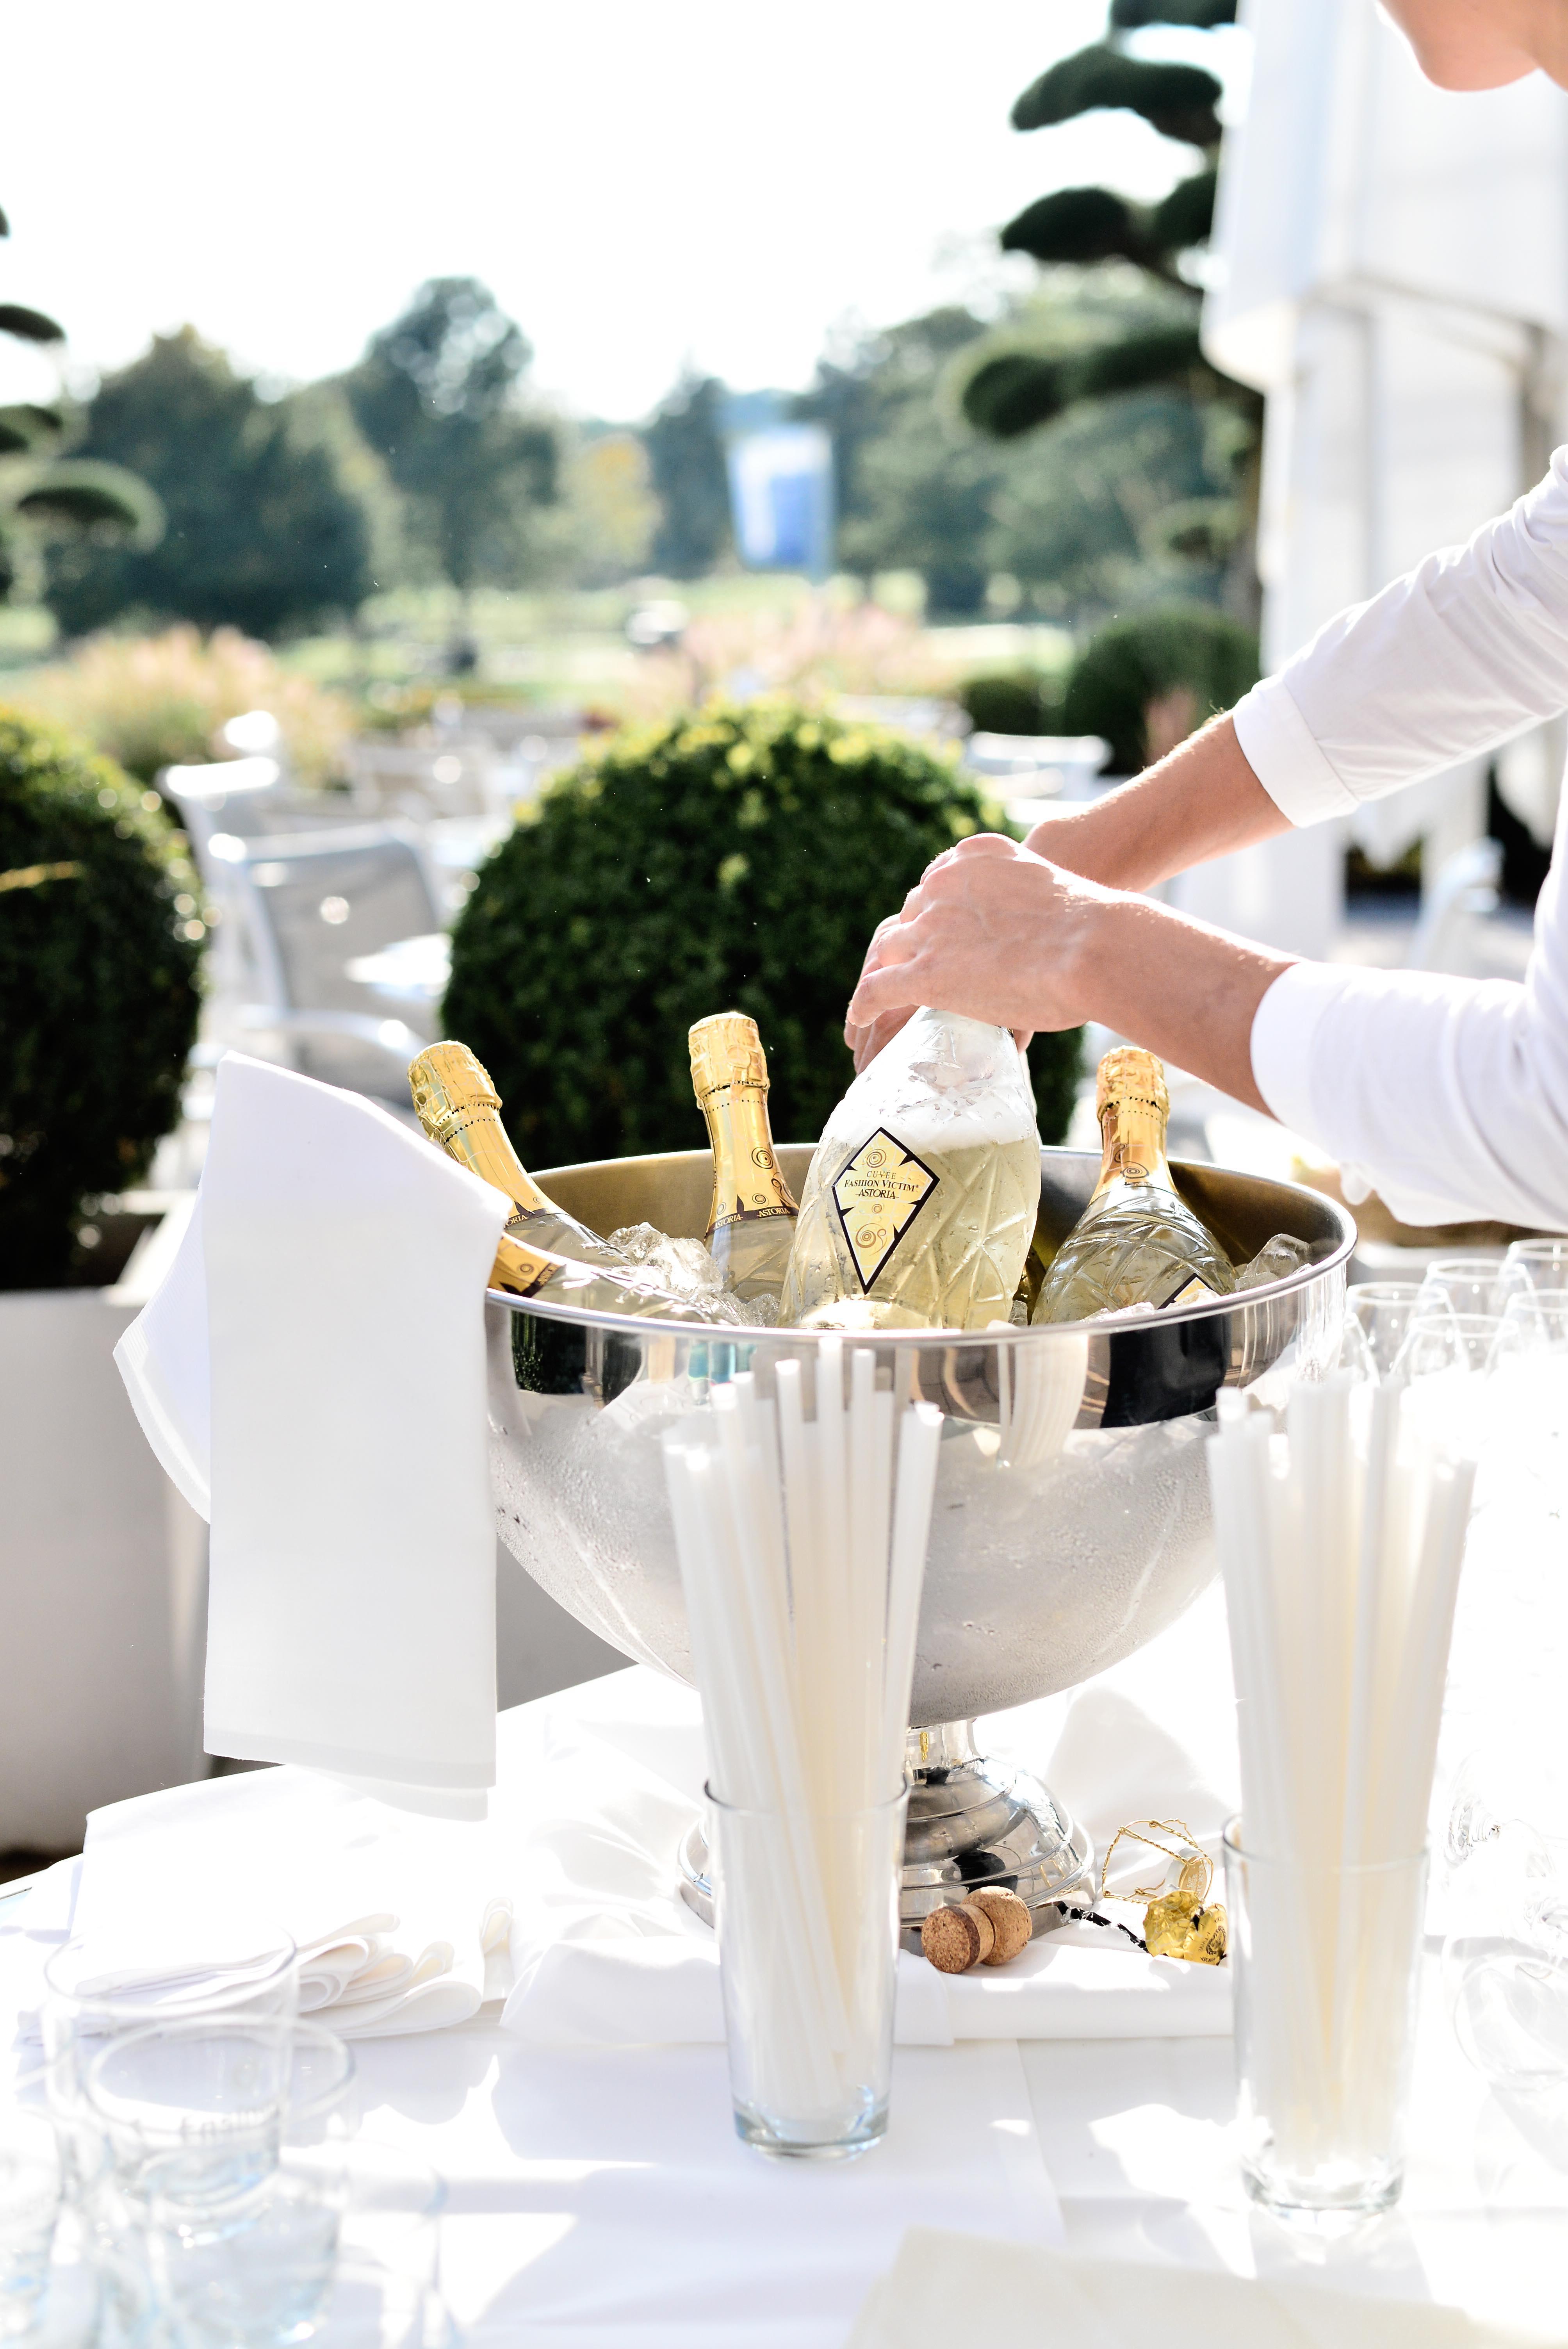 Champagnerbar